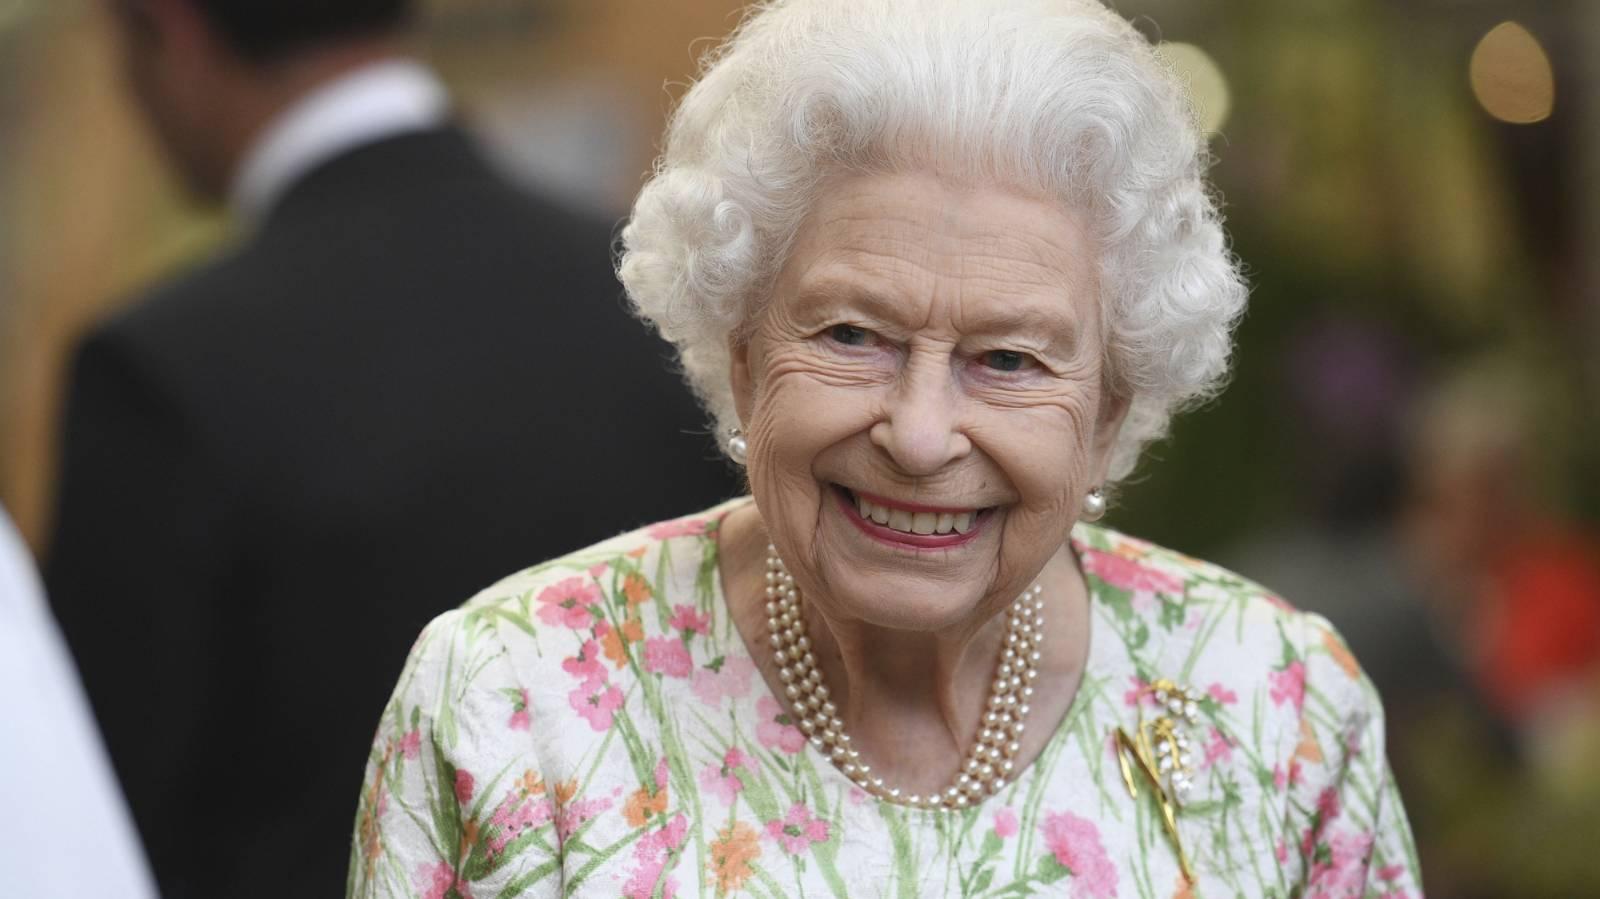 Royals headline the opening of G7 summit